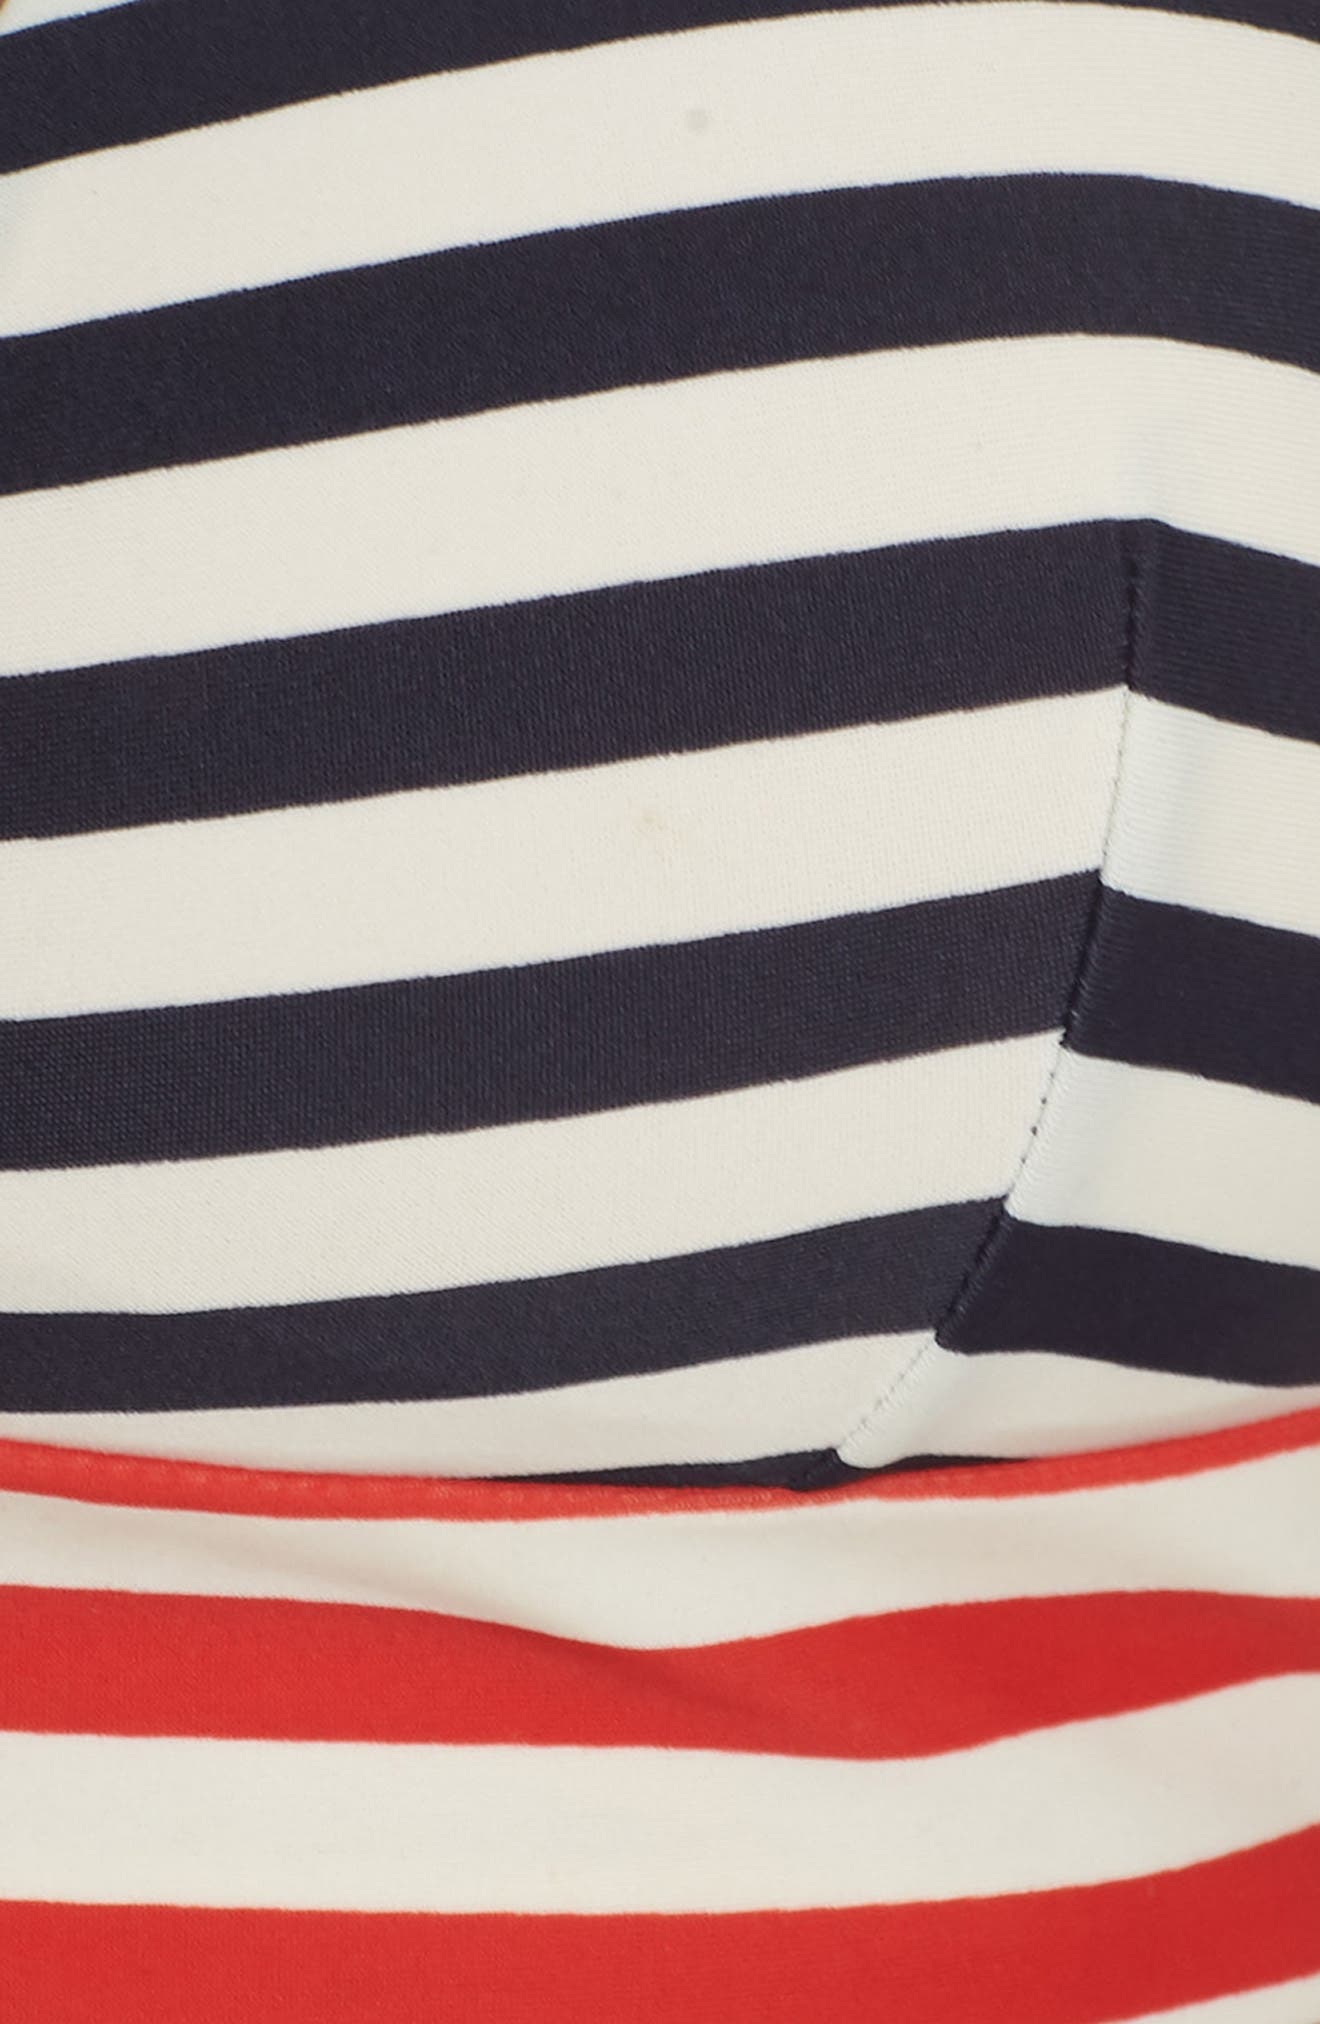 Stripe Banded T-Back Bikini Top,                             Alternate thumbnail 9, color,                             NAVY VIVID FLAME